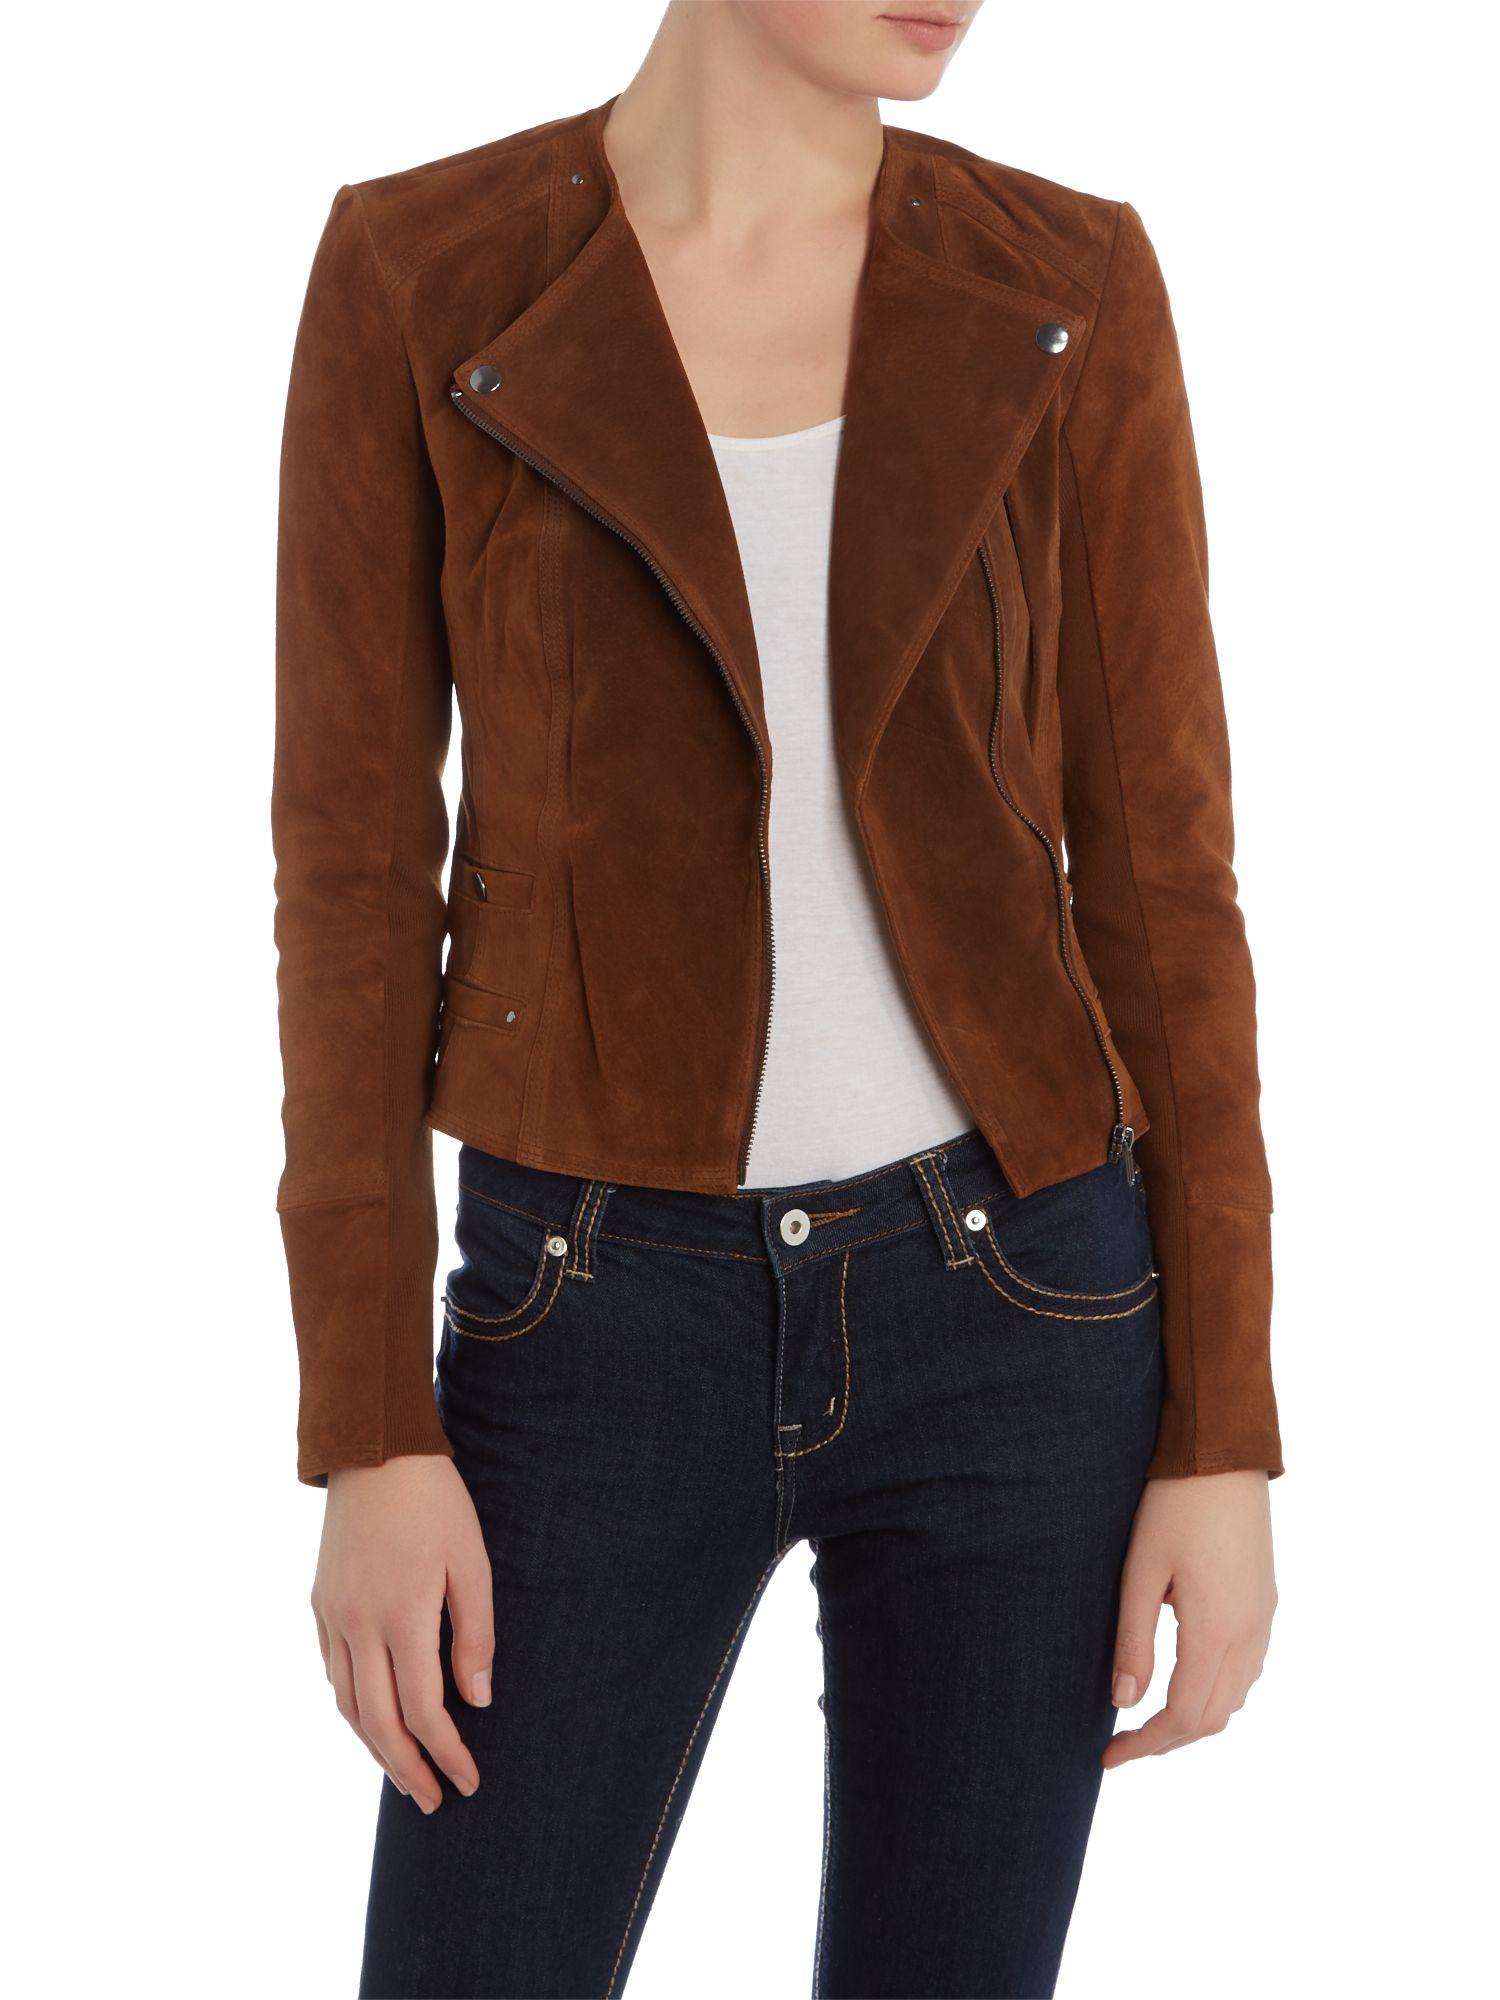 vero moda long sleeve suede jacket in brown lyst. Black Bedroom Furniture Sets. Home Design Ideas